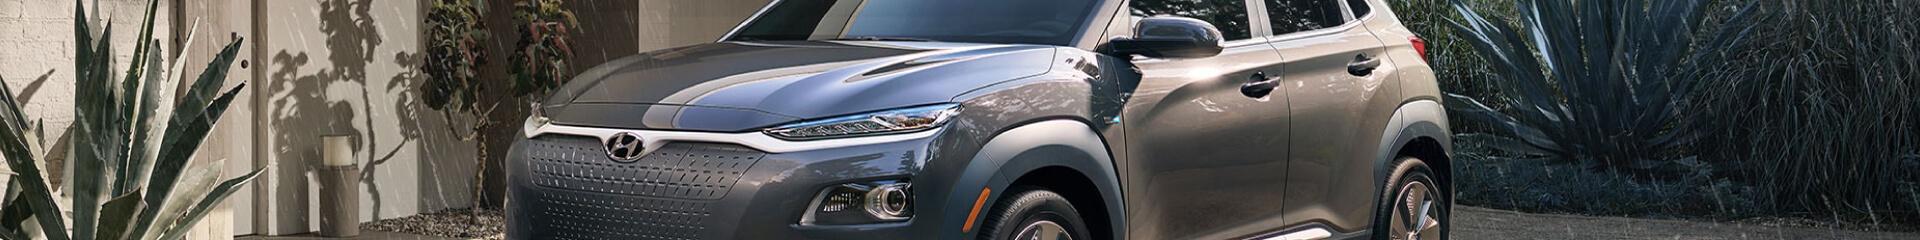 Hyundai Kona électrique 2021